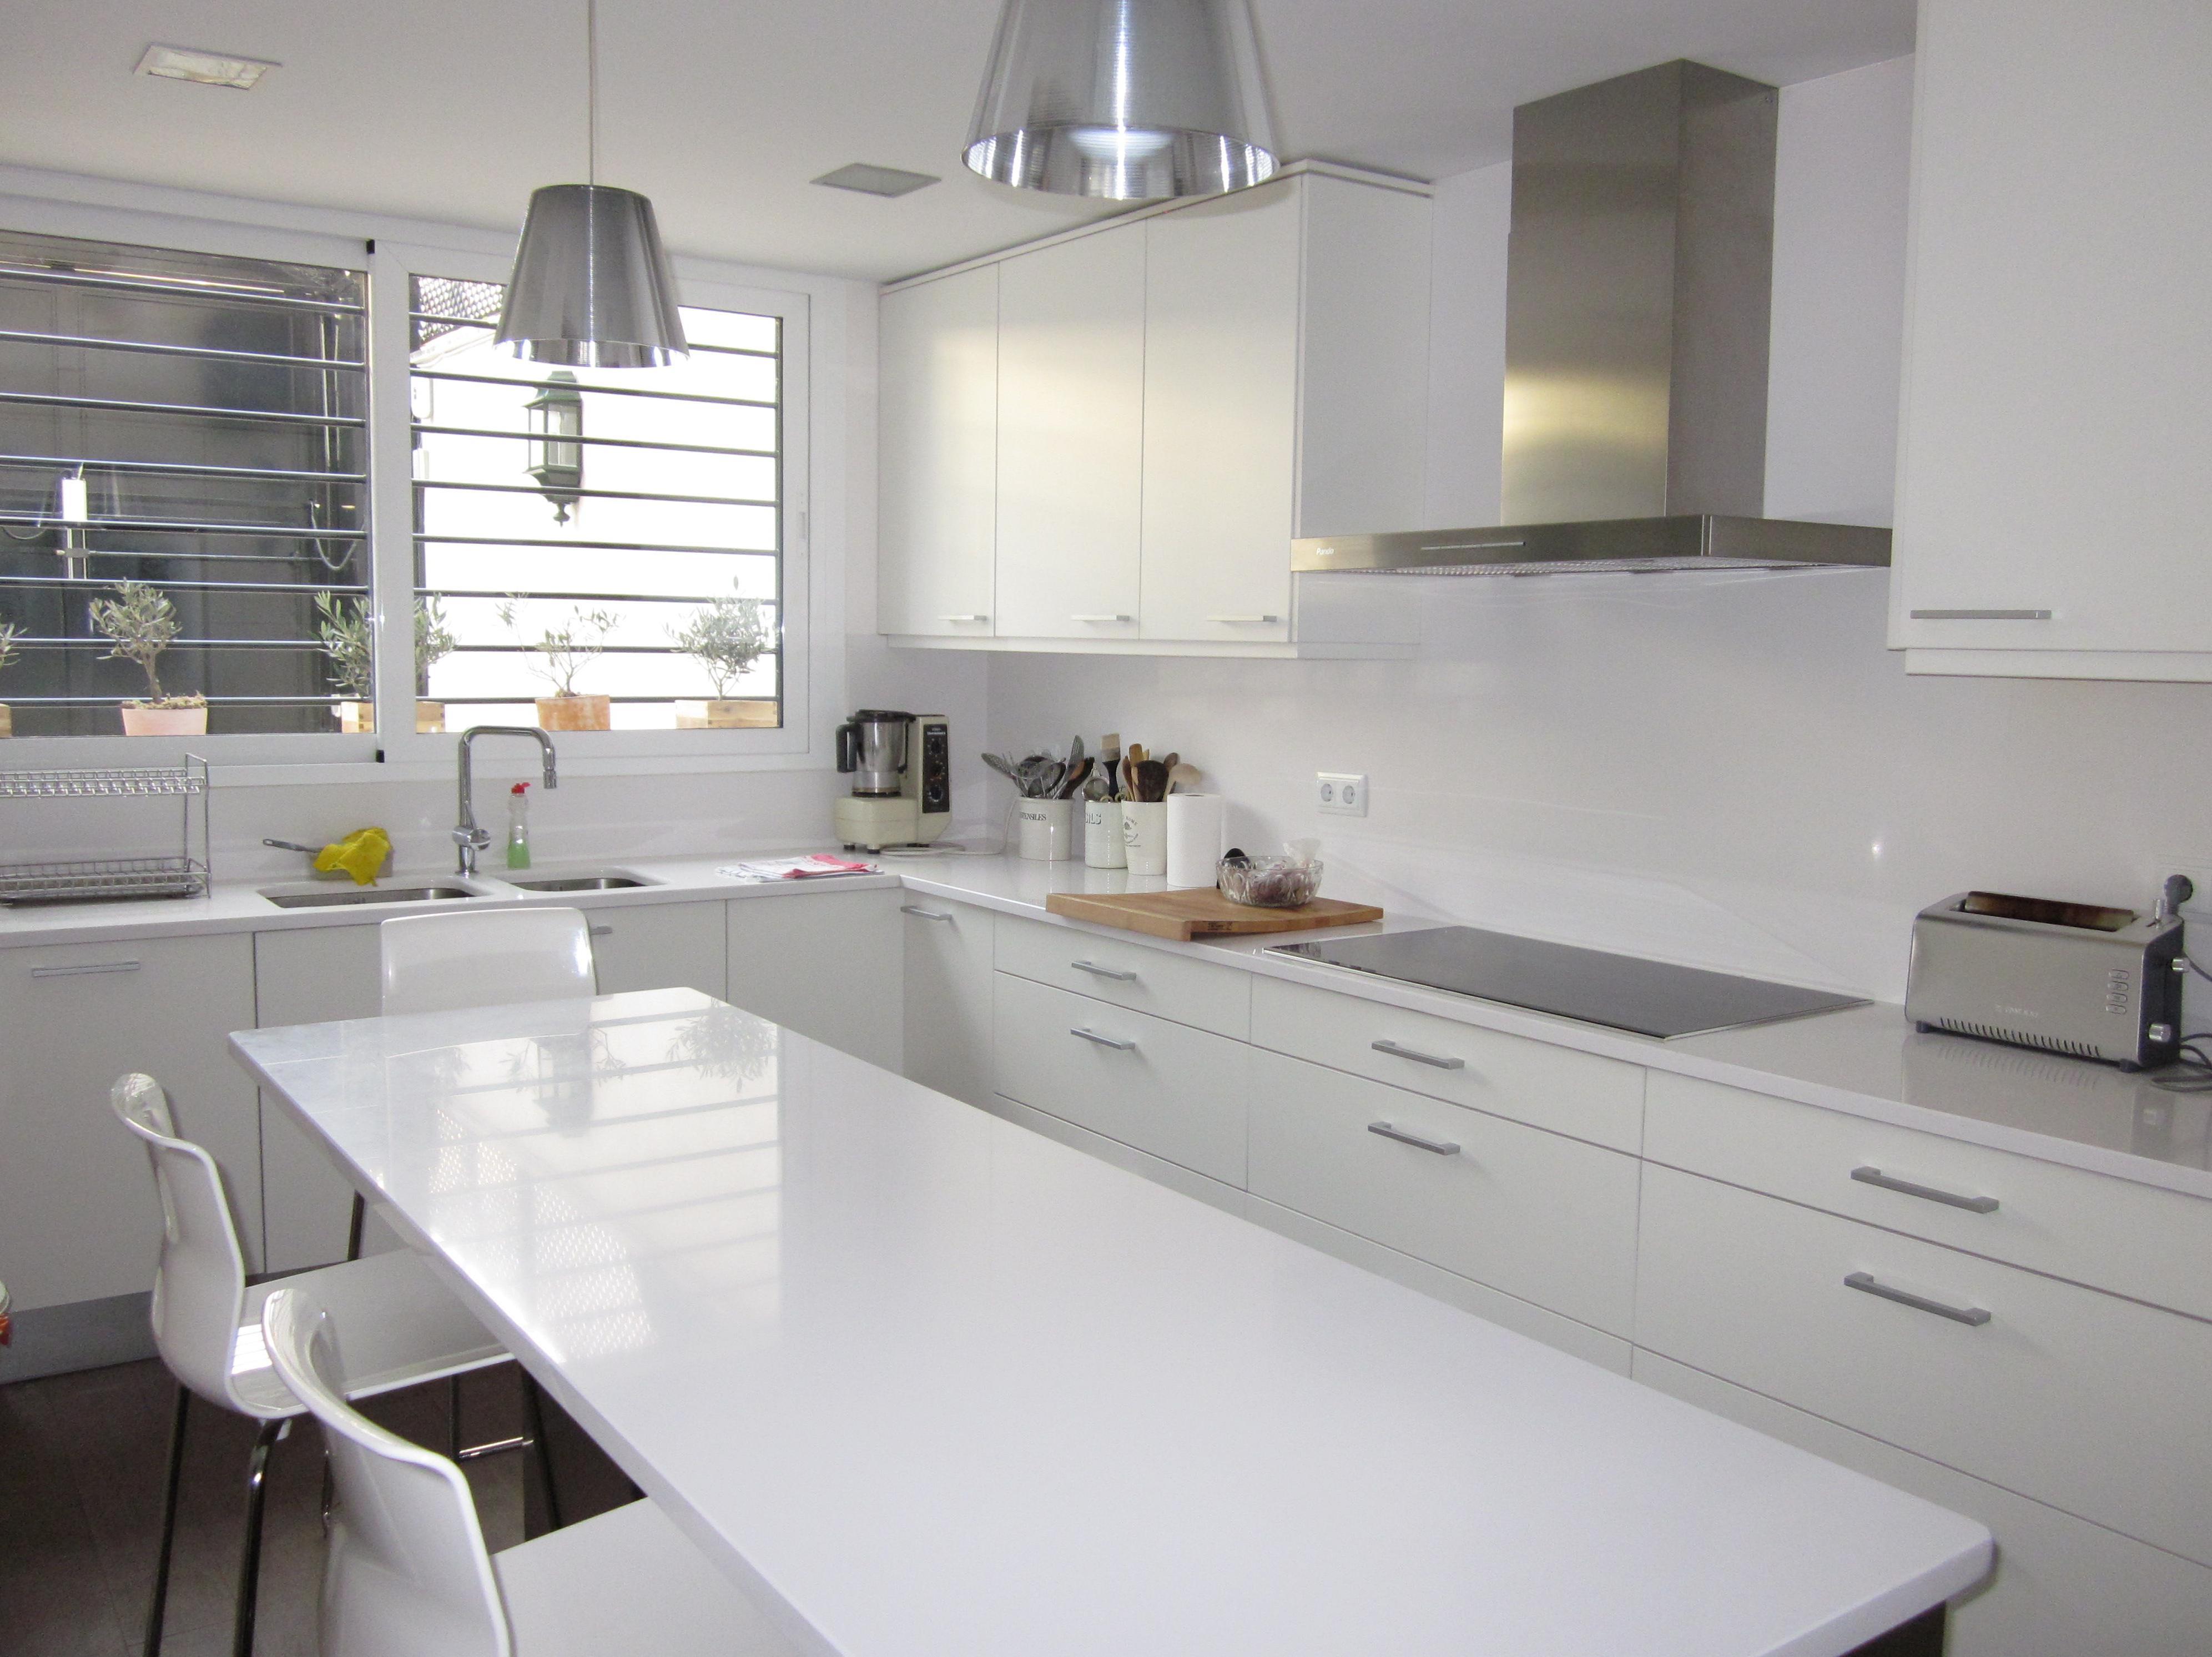 Fotos reformas cocinas dise os arquitect nicos for Reformas cocinas barcelona